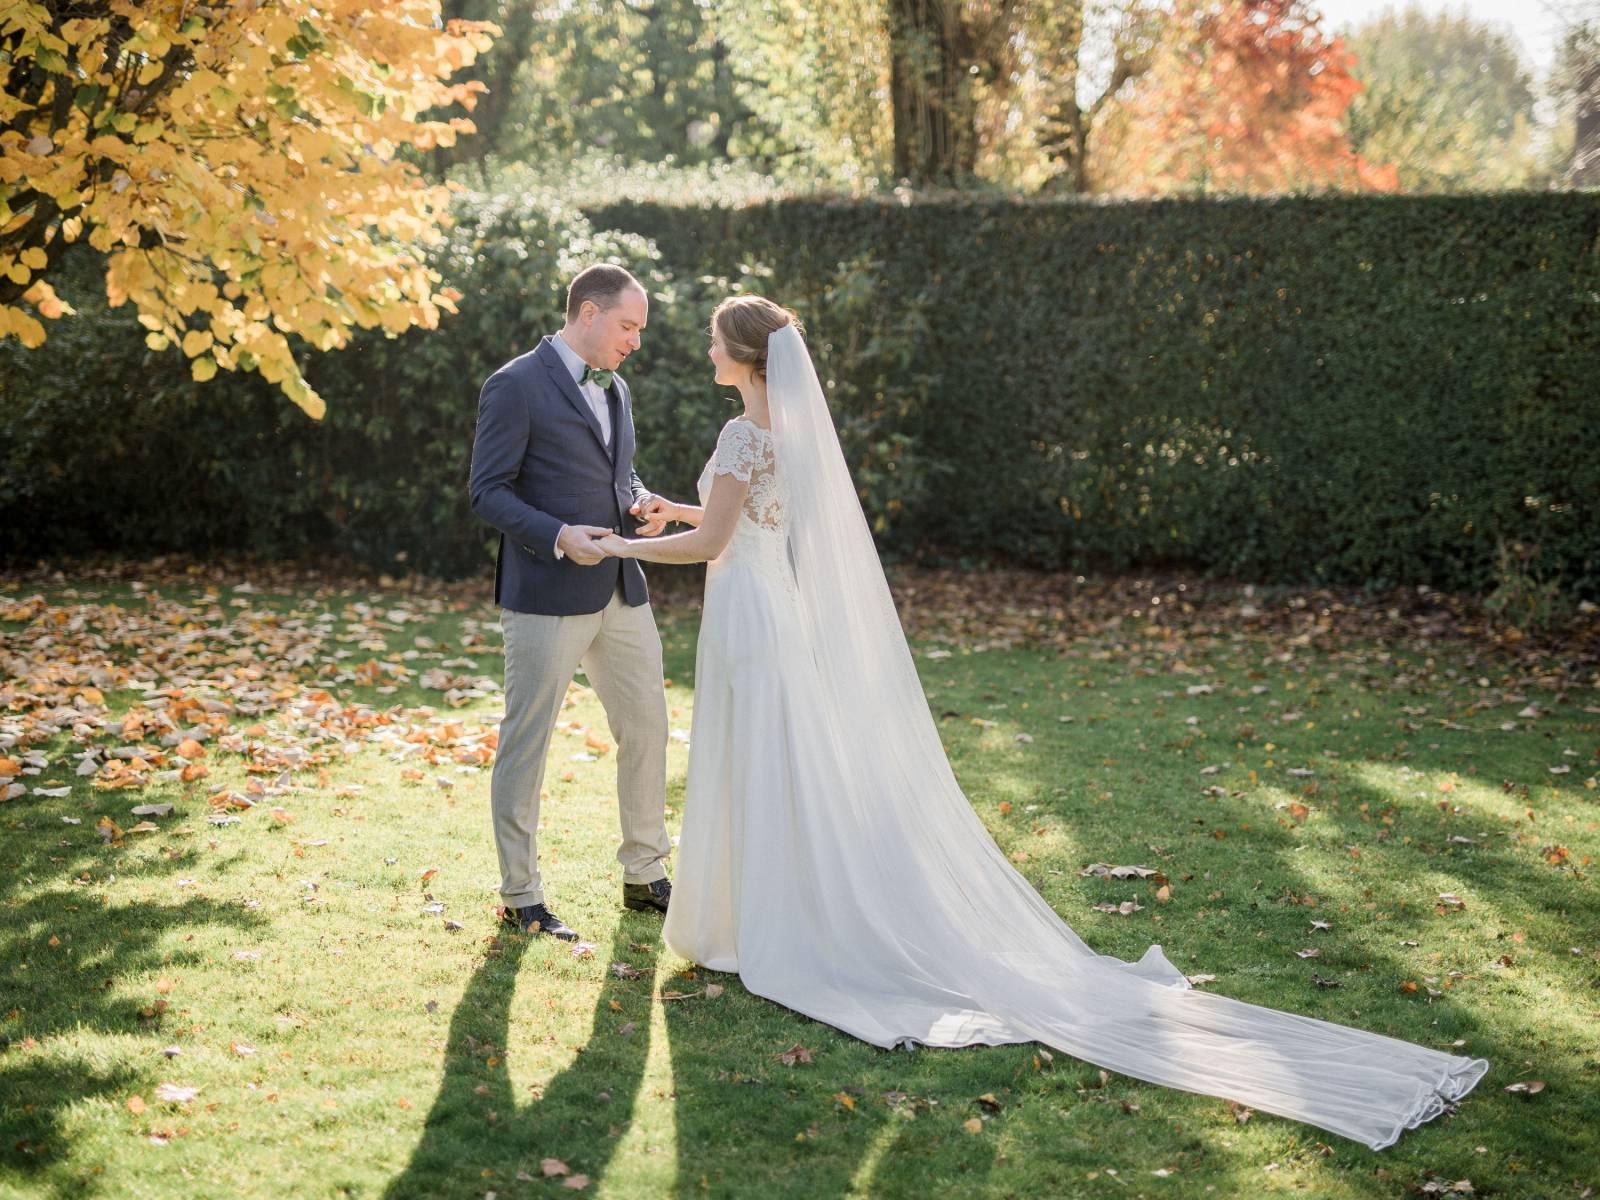 Elisabeth Van Lent Fine Art Wedding Photography - Ferme de Balingue wedding-4